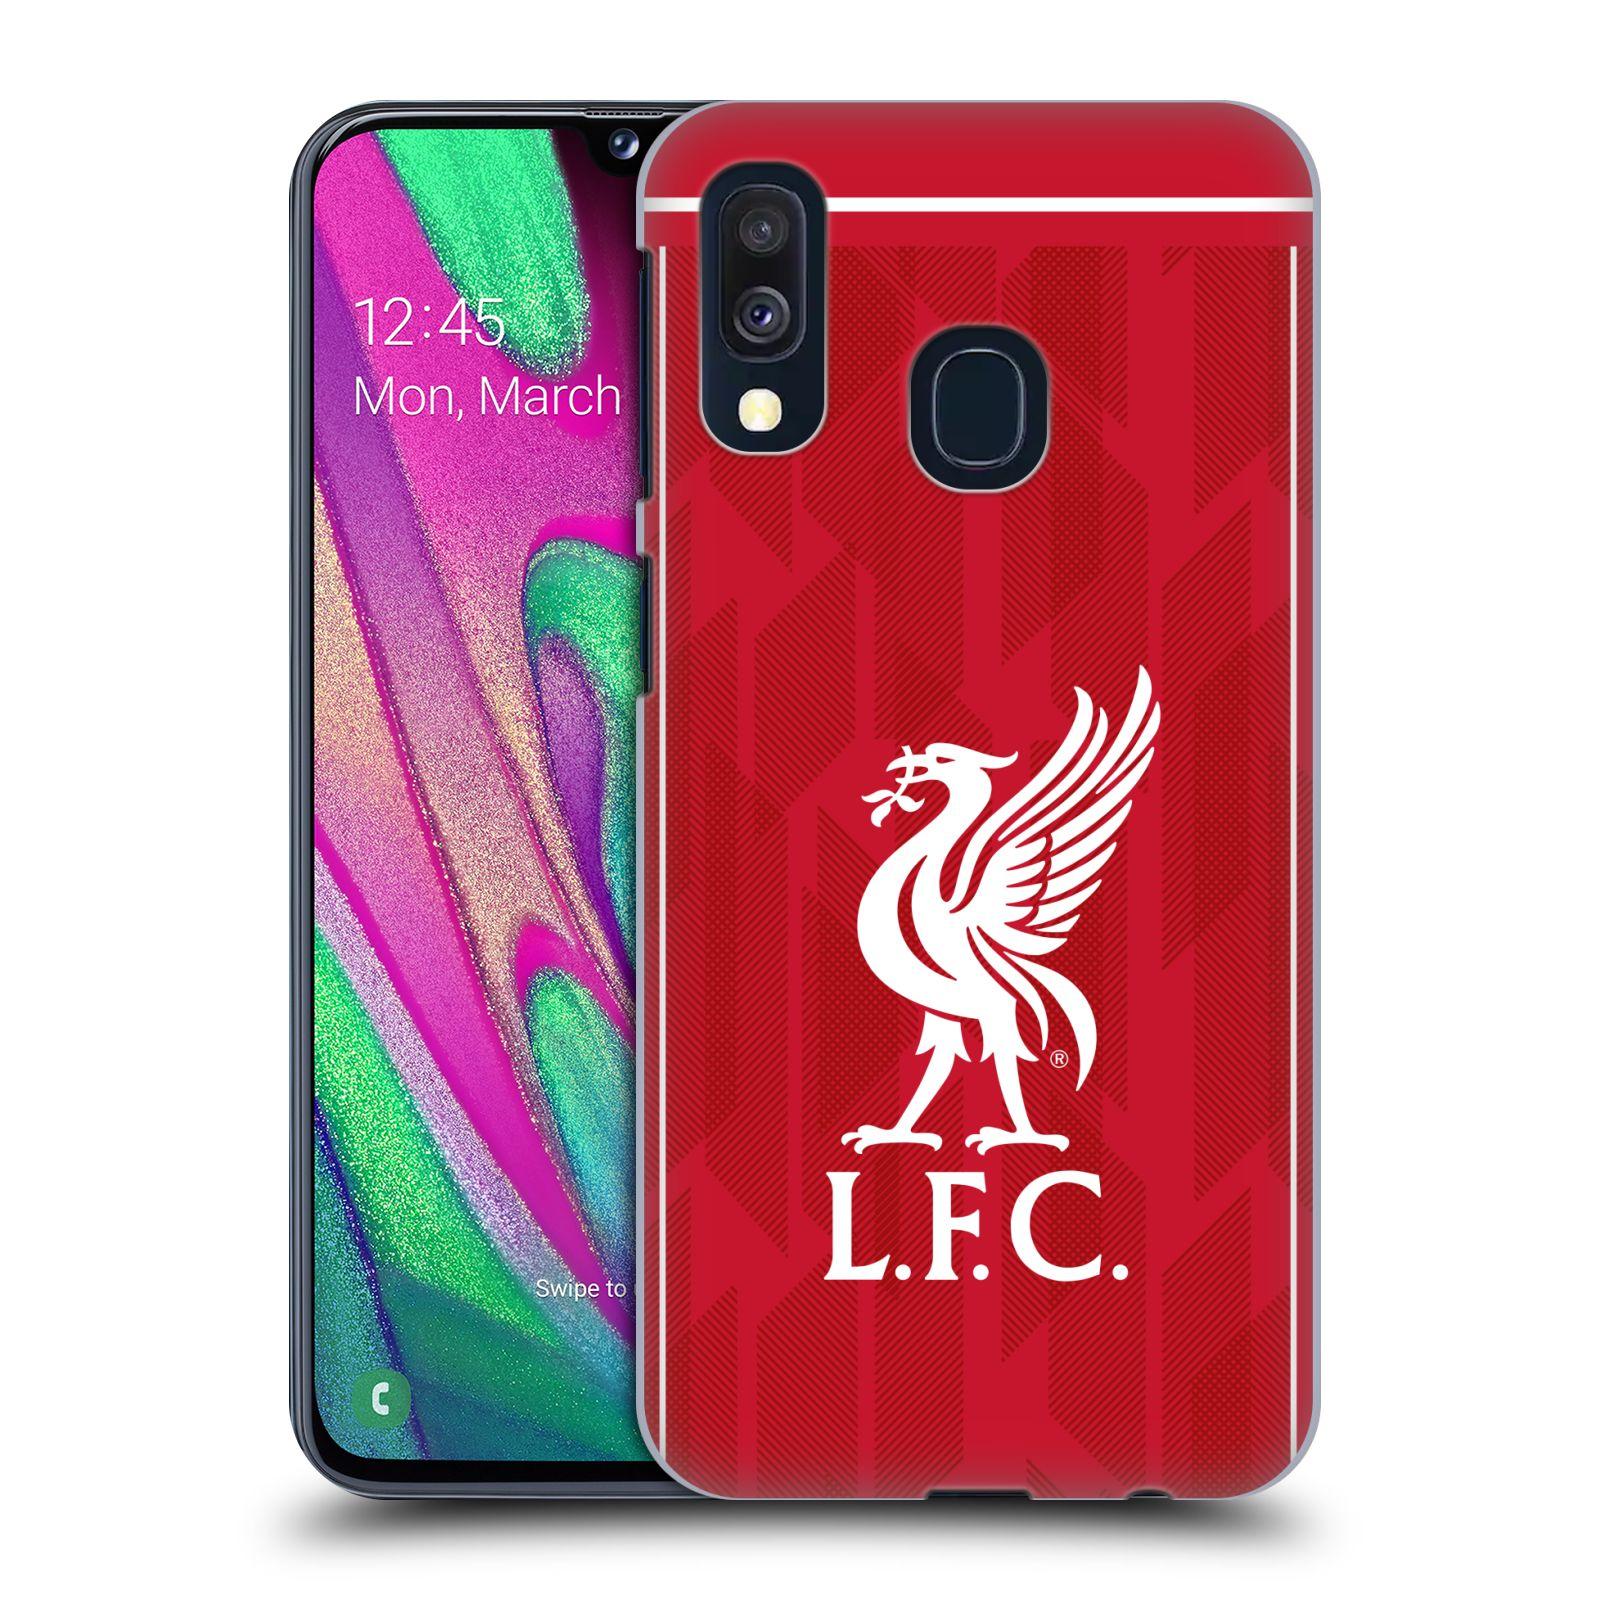 Plastové pouzdro na mobil Samsung Galaxy A40 - Head Case - Liverpool FC - L.F.C. Home kit